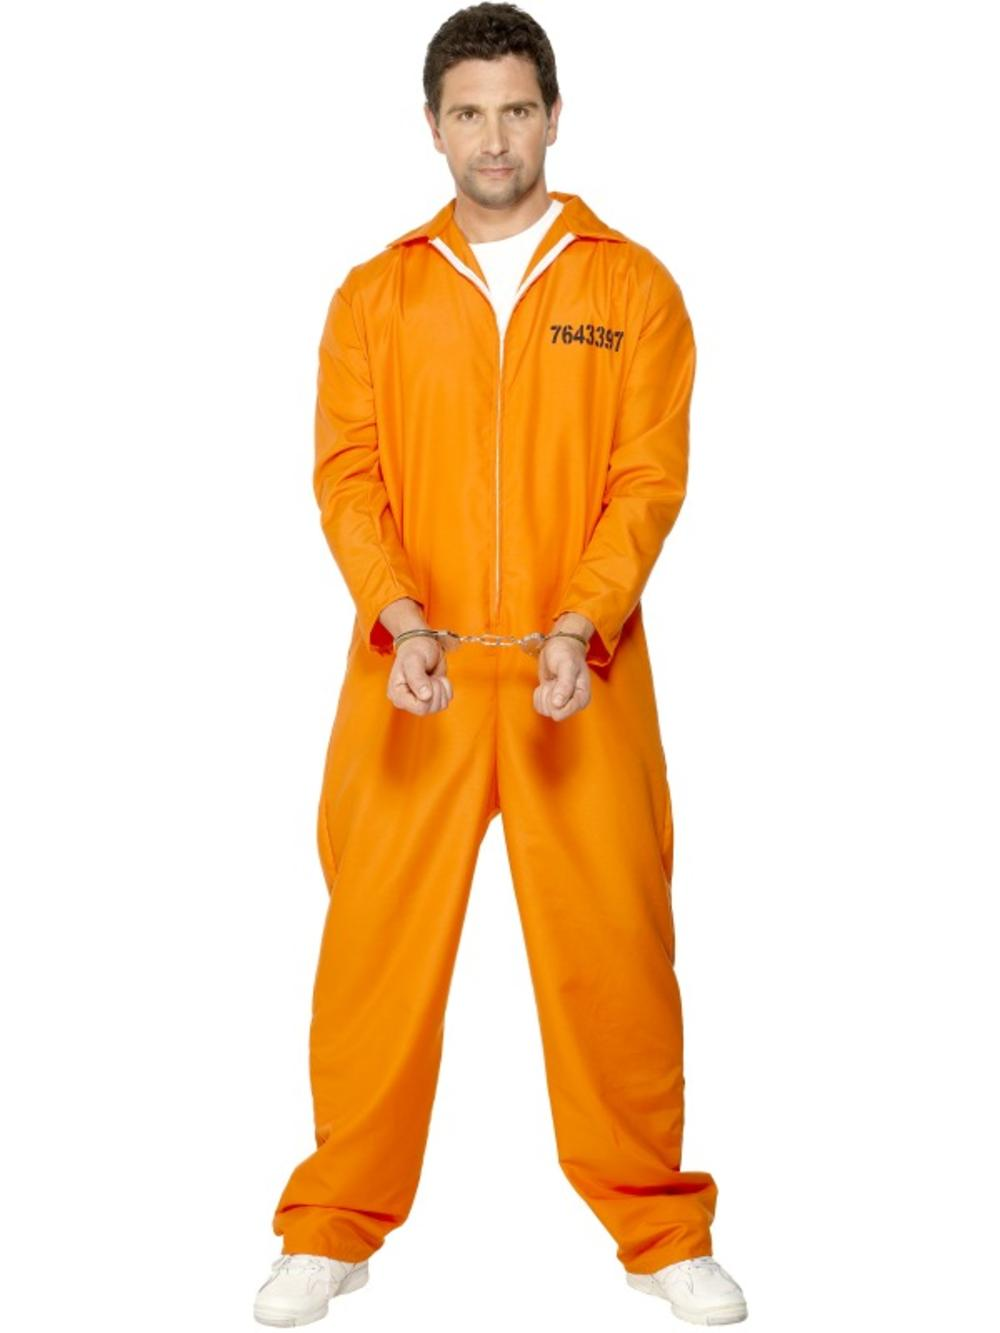 Prisoner Fancy Dress Orange Boiler Suit Mens Convict Halloween Adults Costume